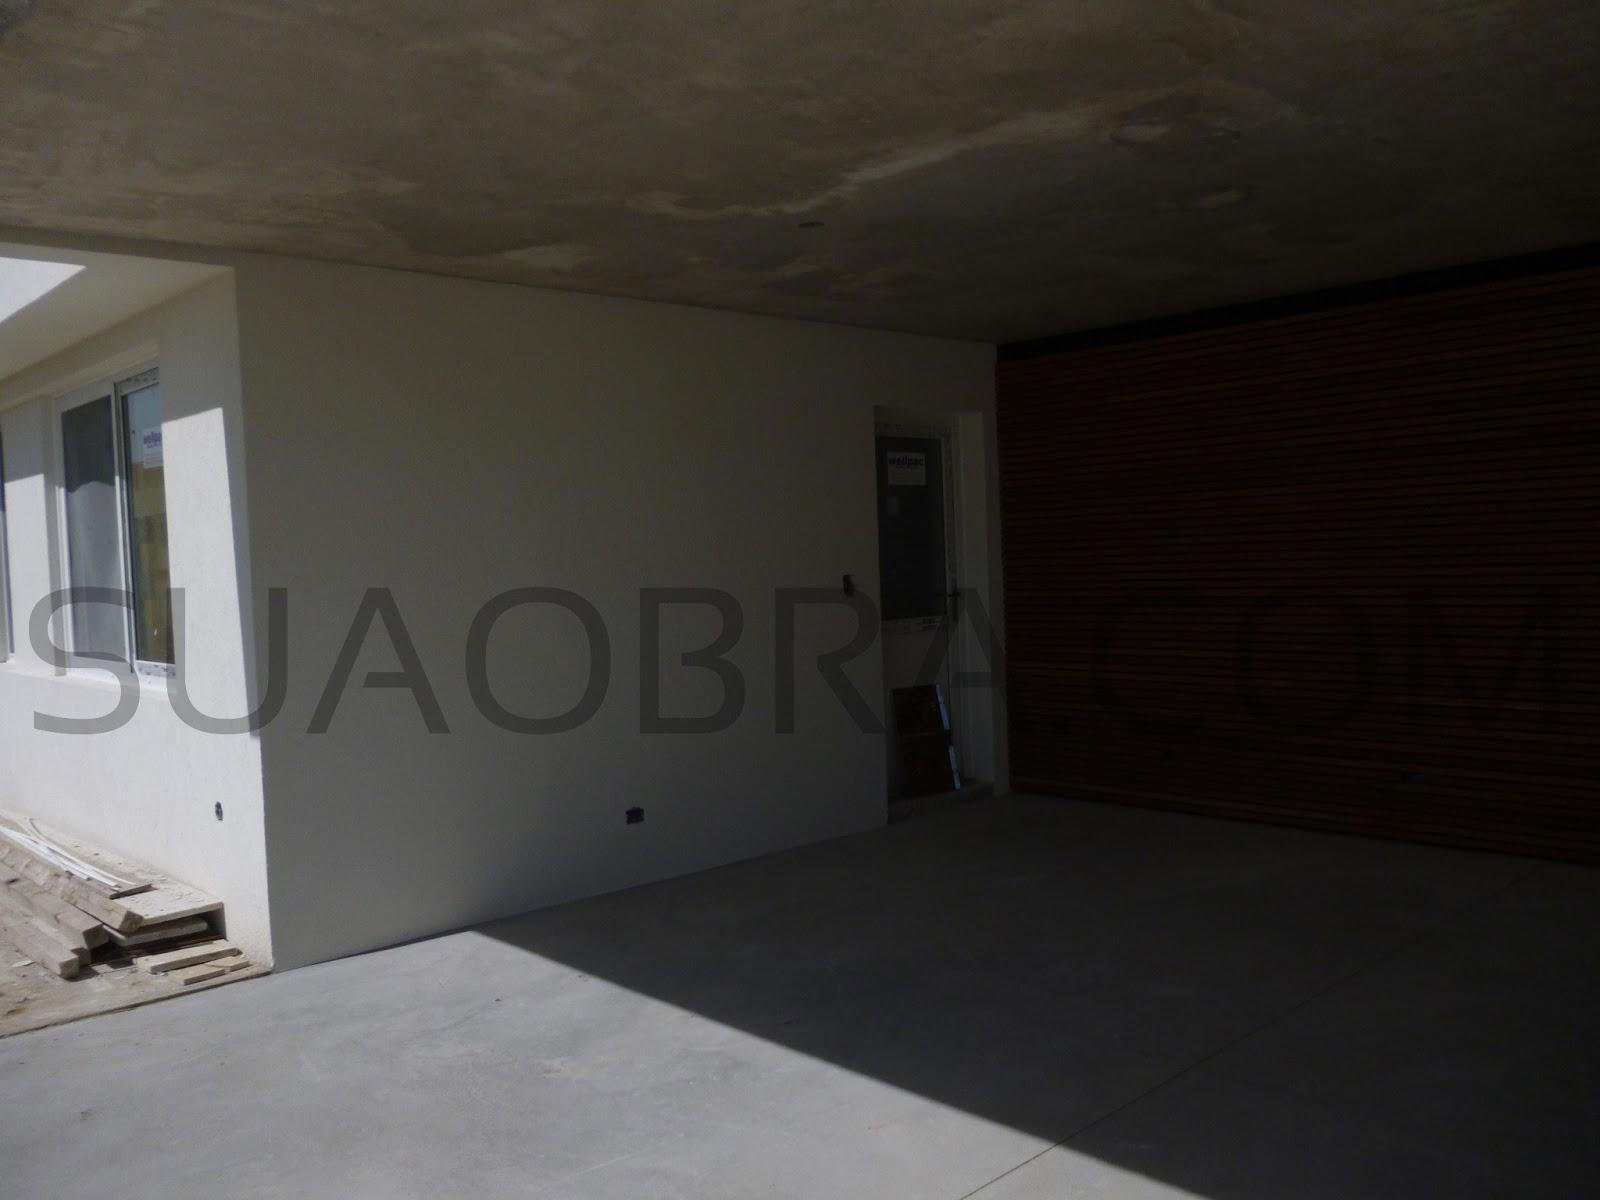 Blanco plus medio revestimiento pl stico para paredes - Precio de revestimiento para pared ...